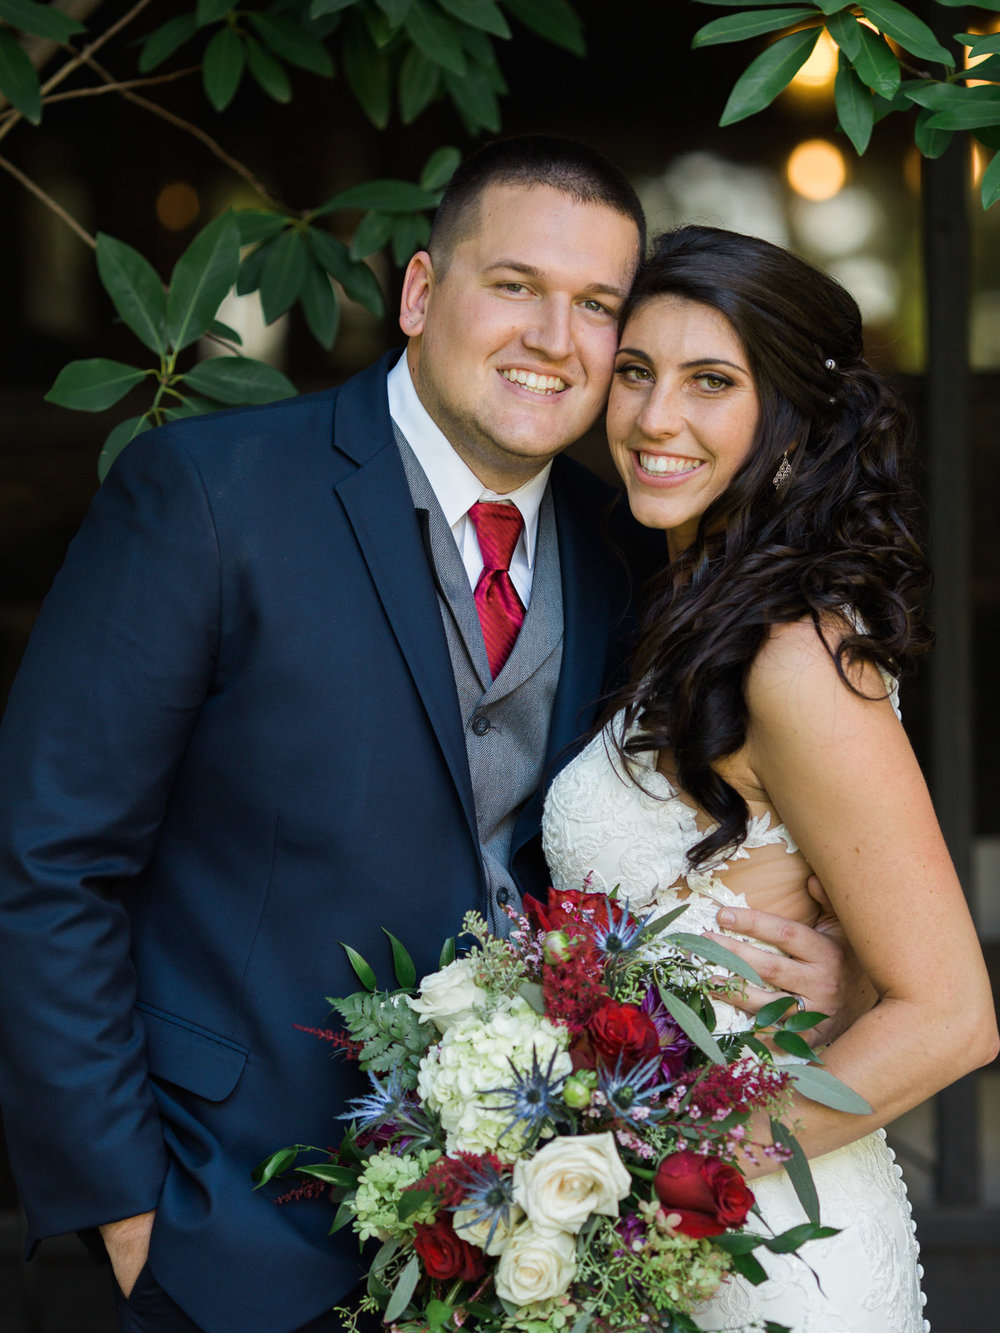 elegant-hoover-hall-wedding-photos-by-matt-erickson-photography-12.jpg